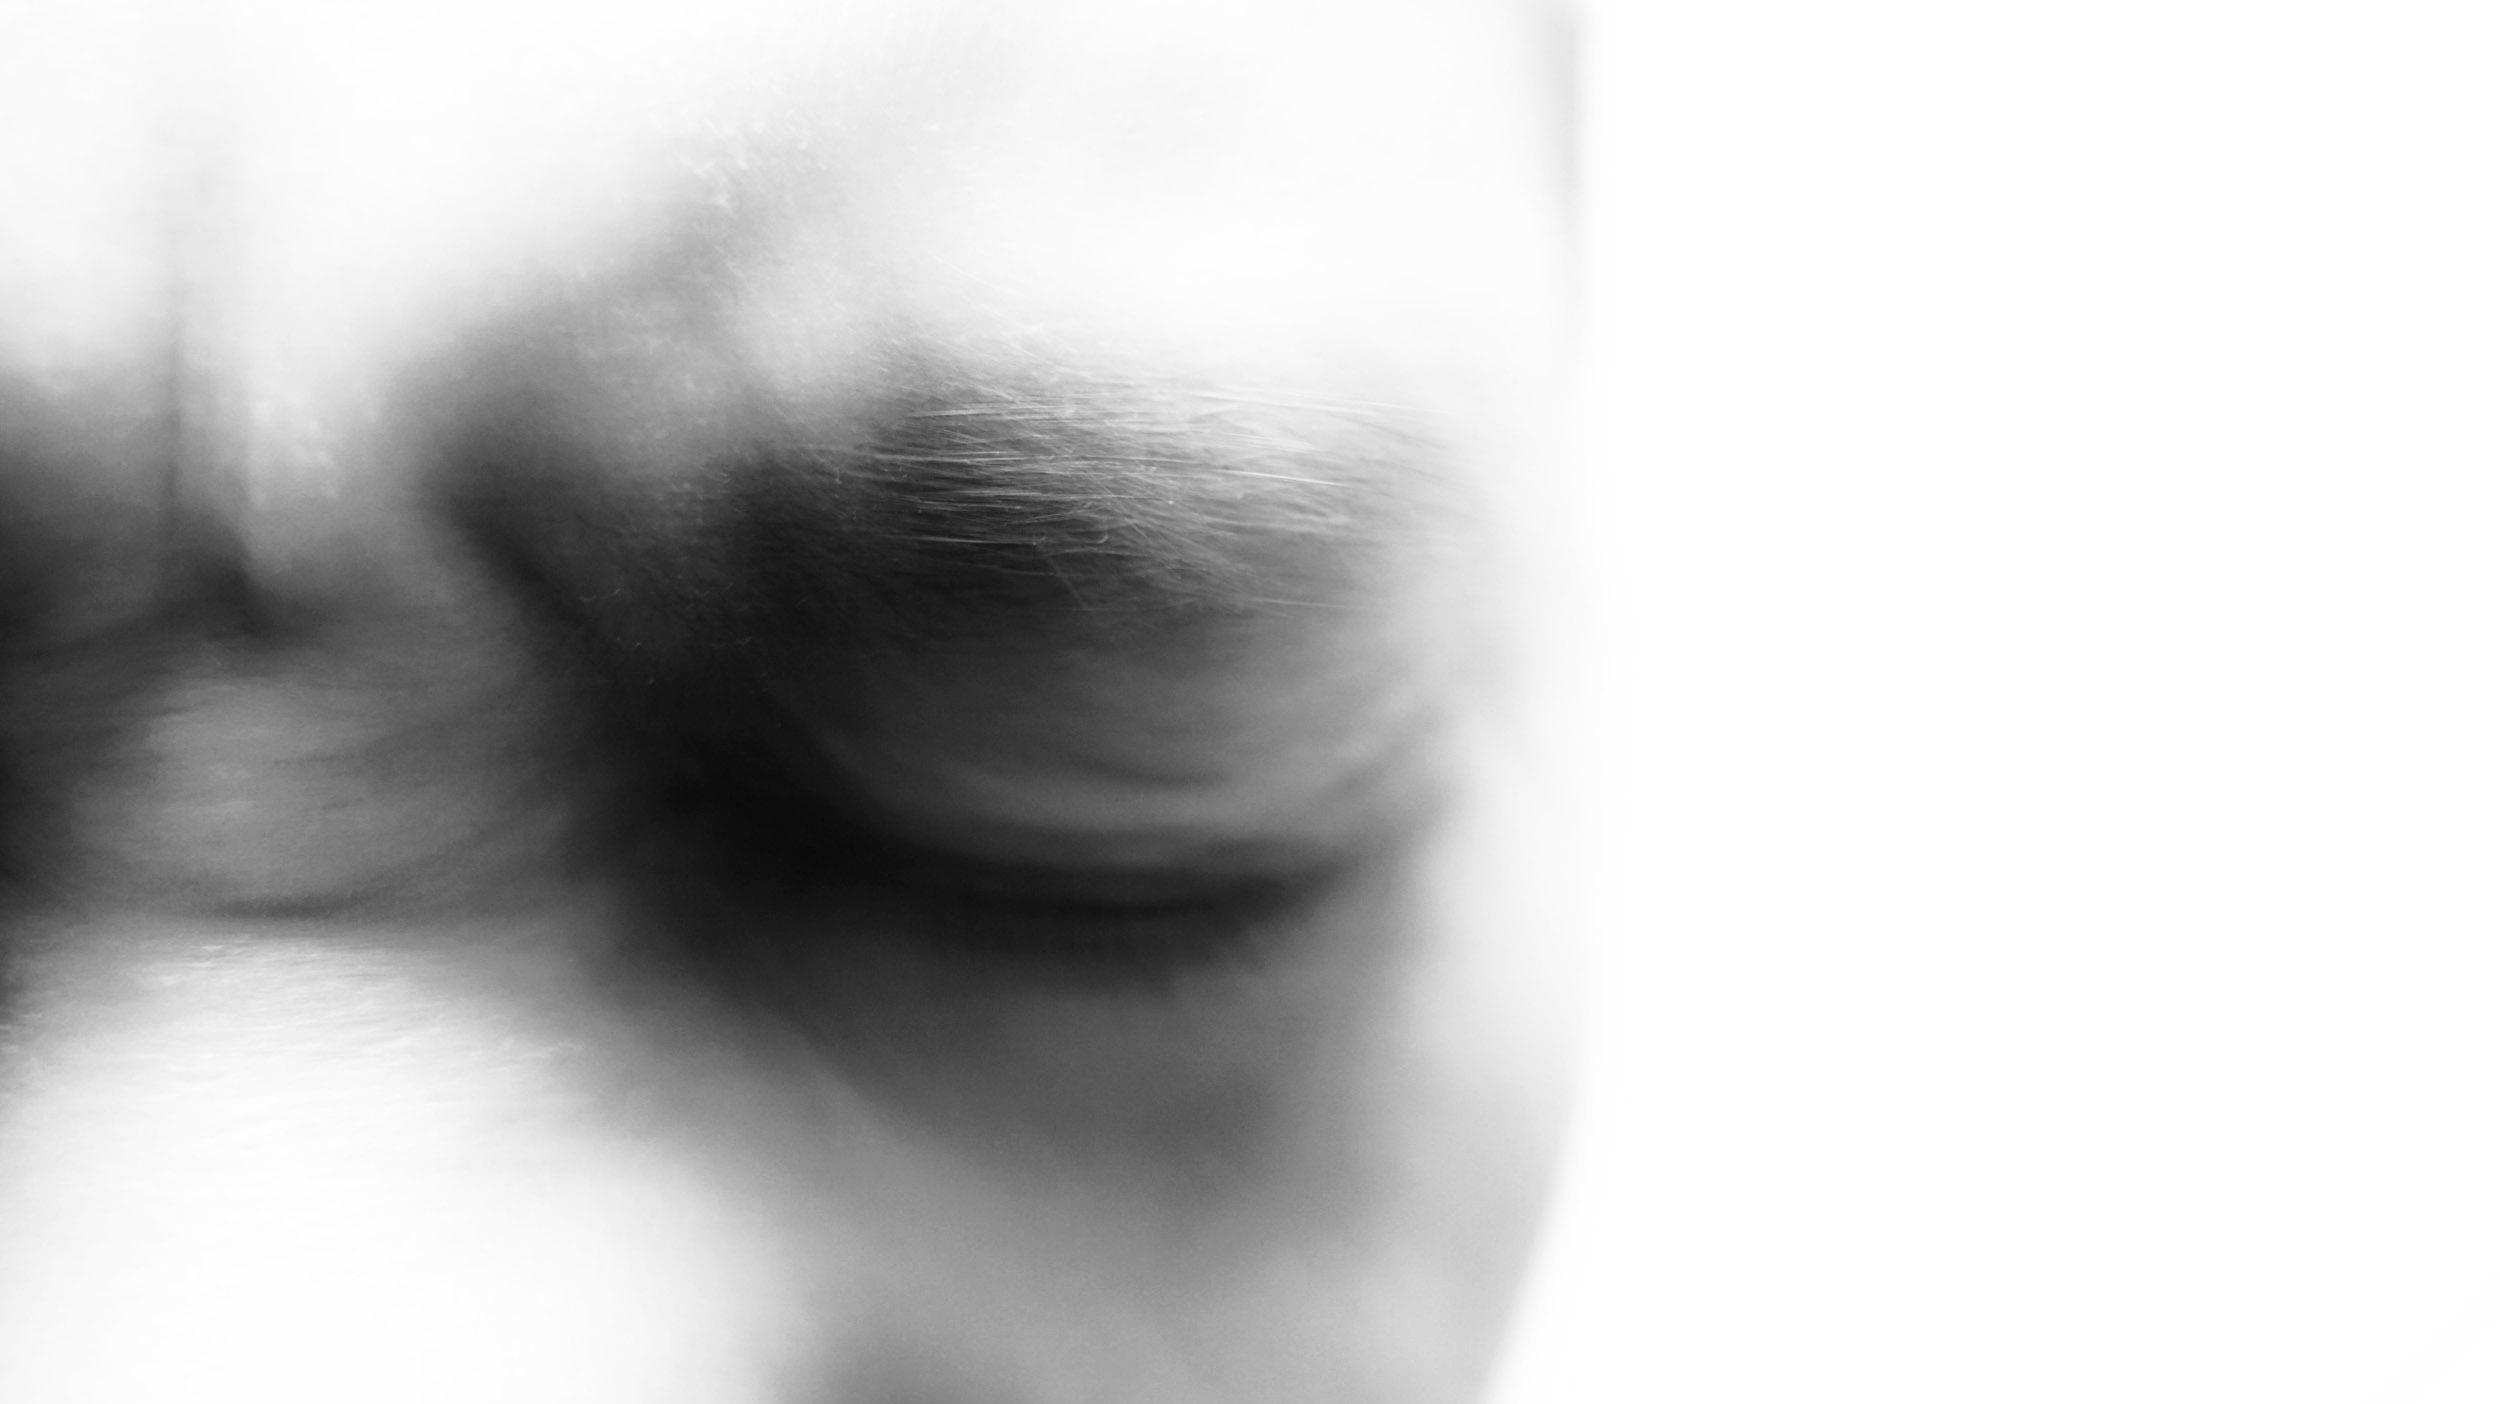 Help - psychosomatic symptoms